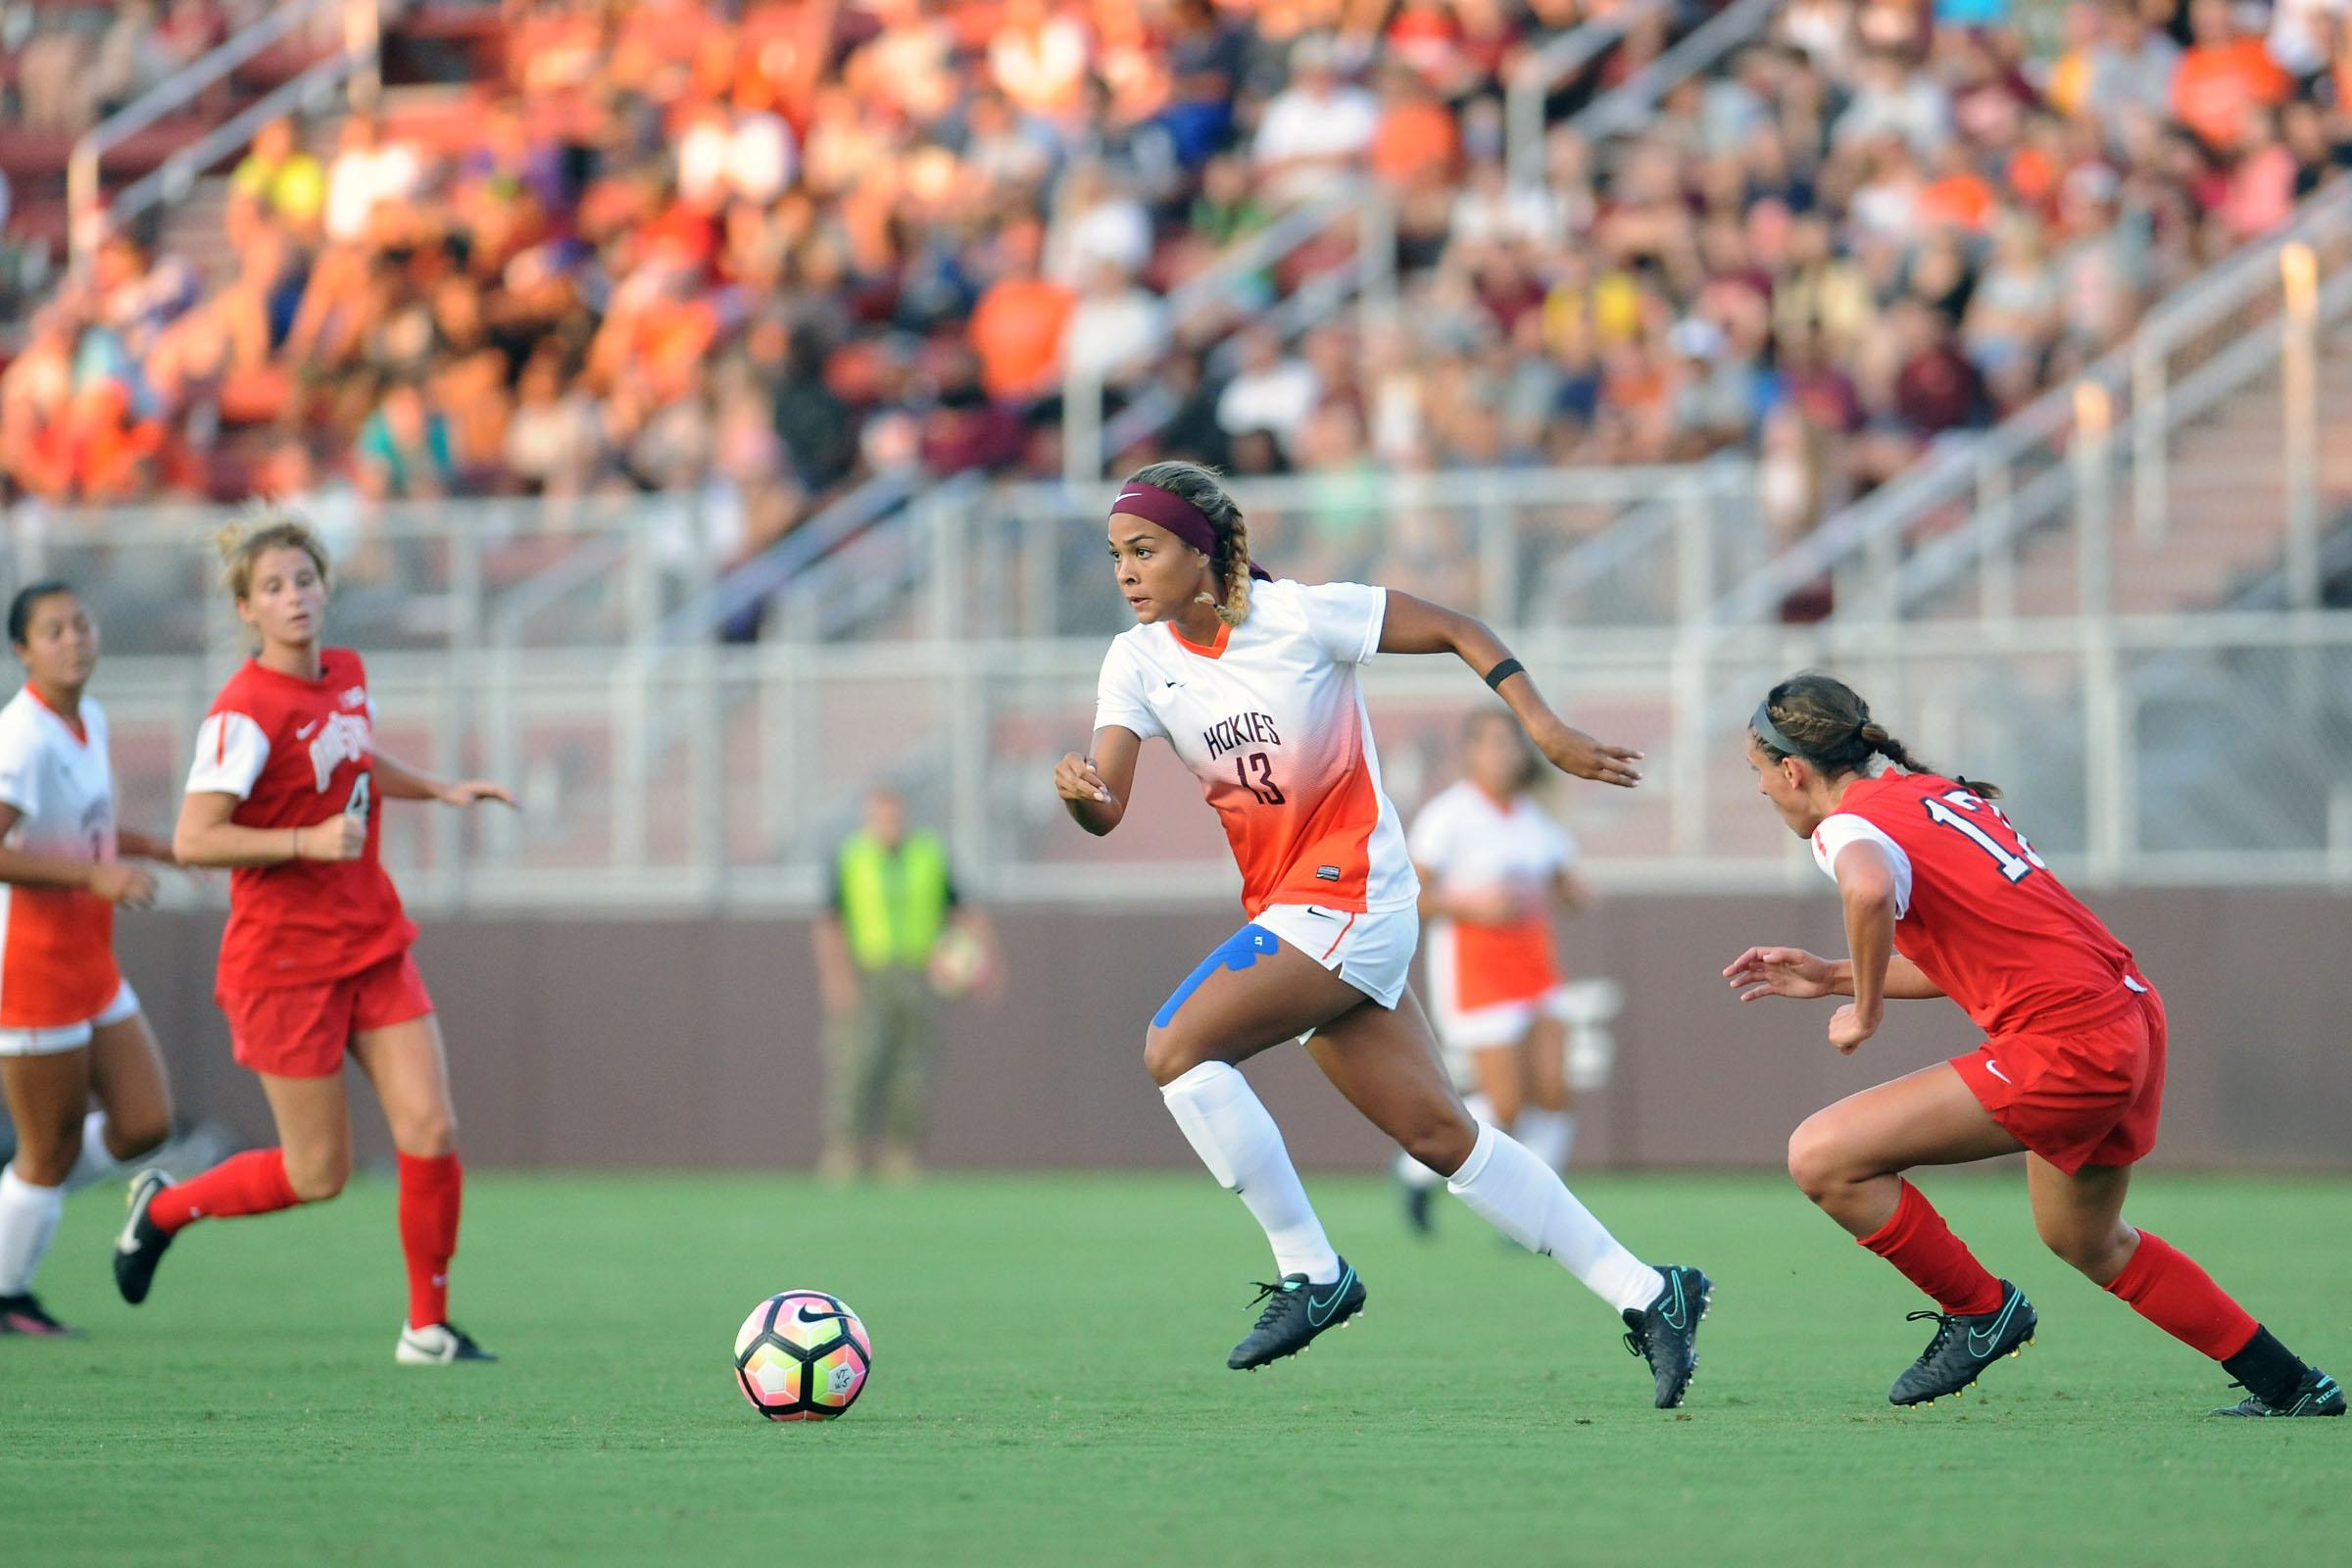 Virginia Tech Women's Soccer vs. Ohio State